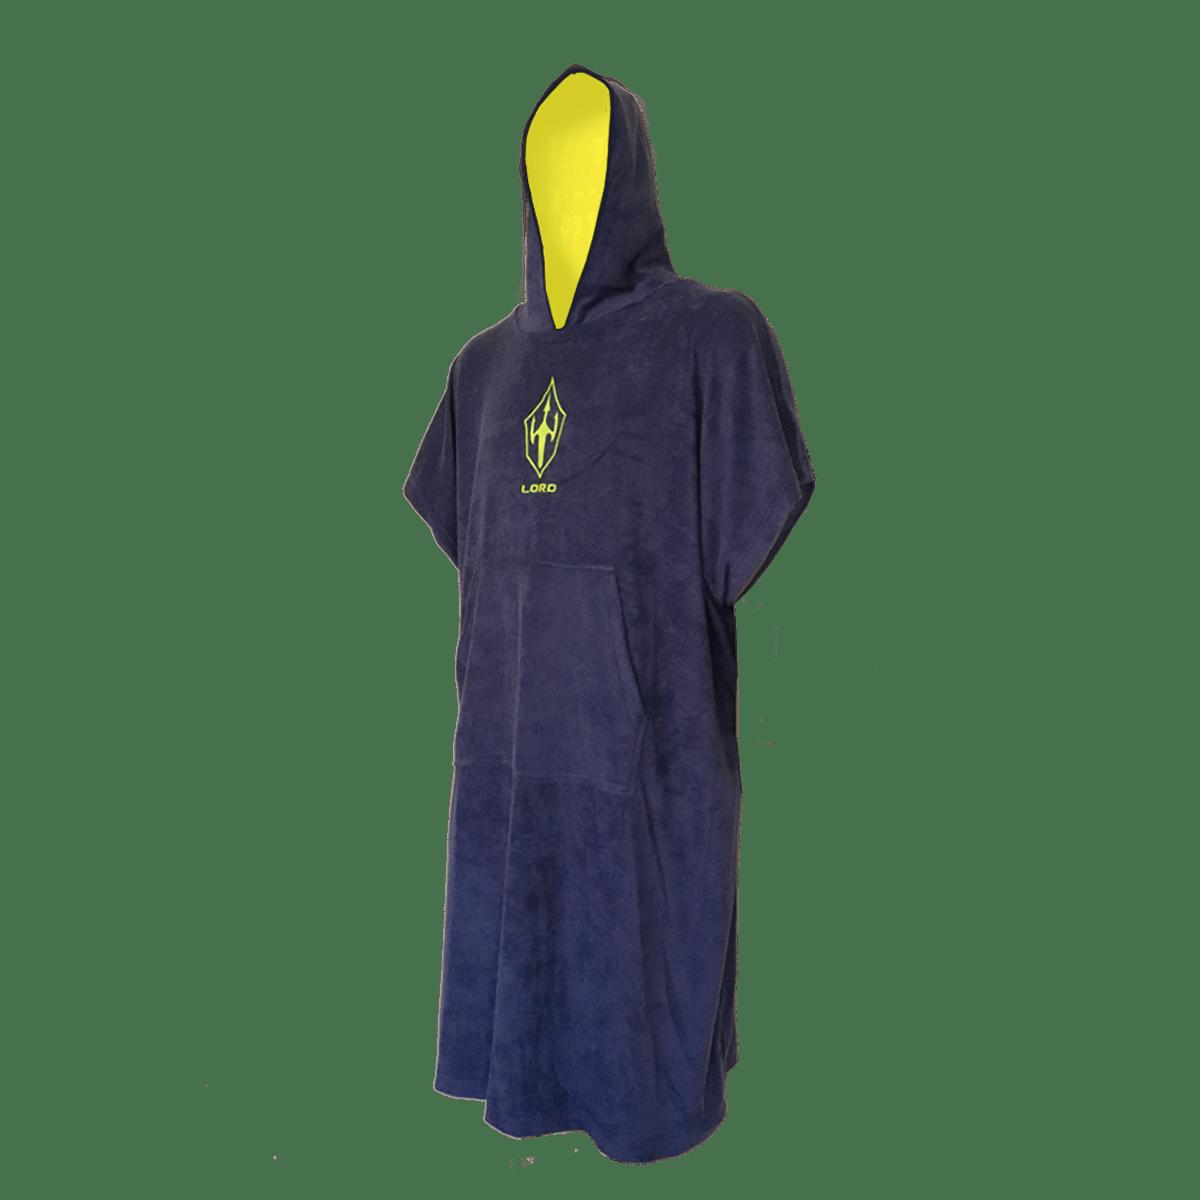 Toalha Poncho de Surf LORD Blue Ocean - Marinho - Adulto